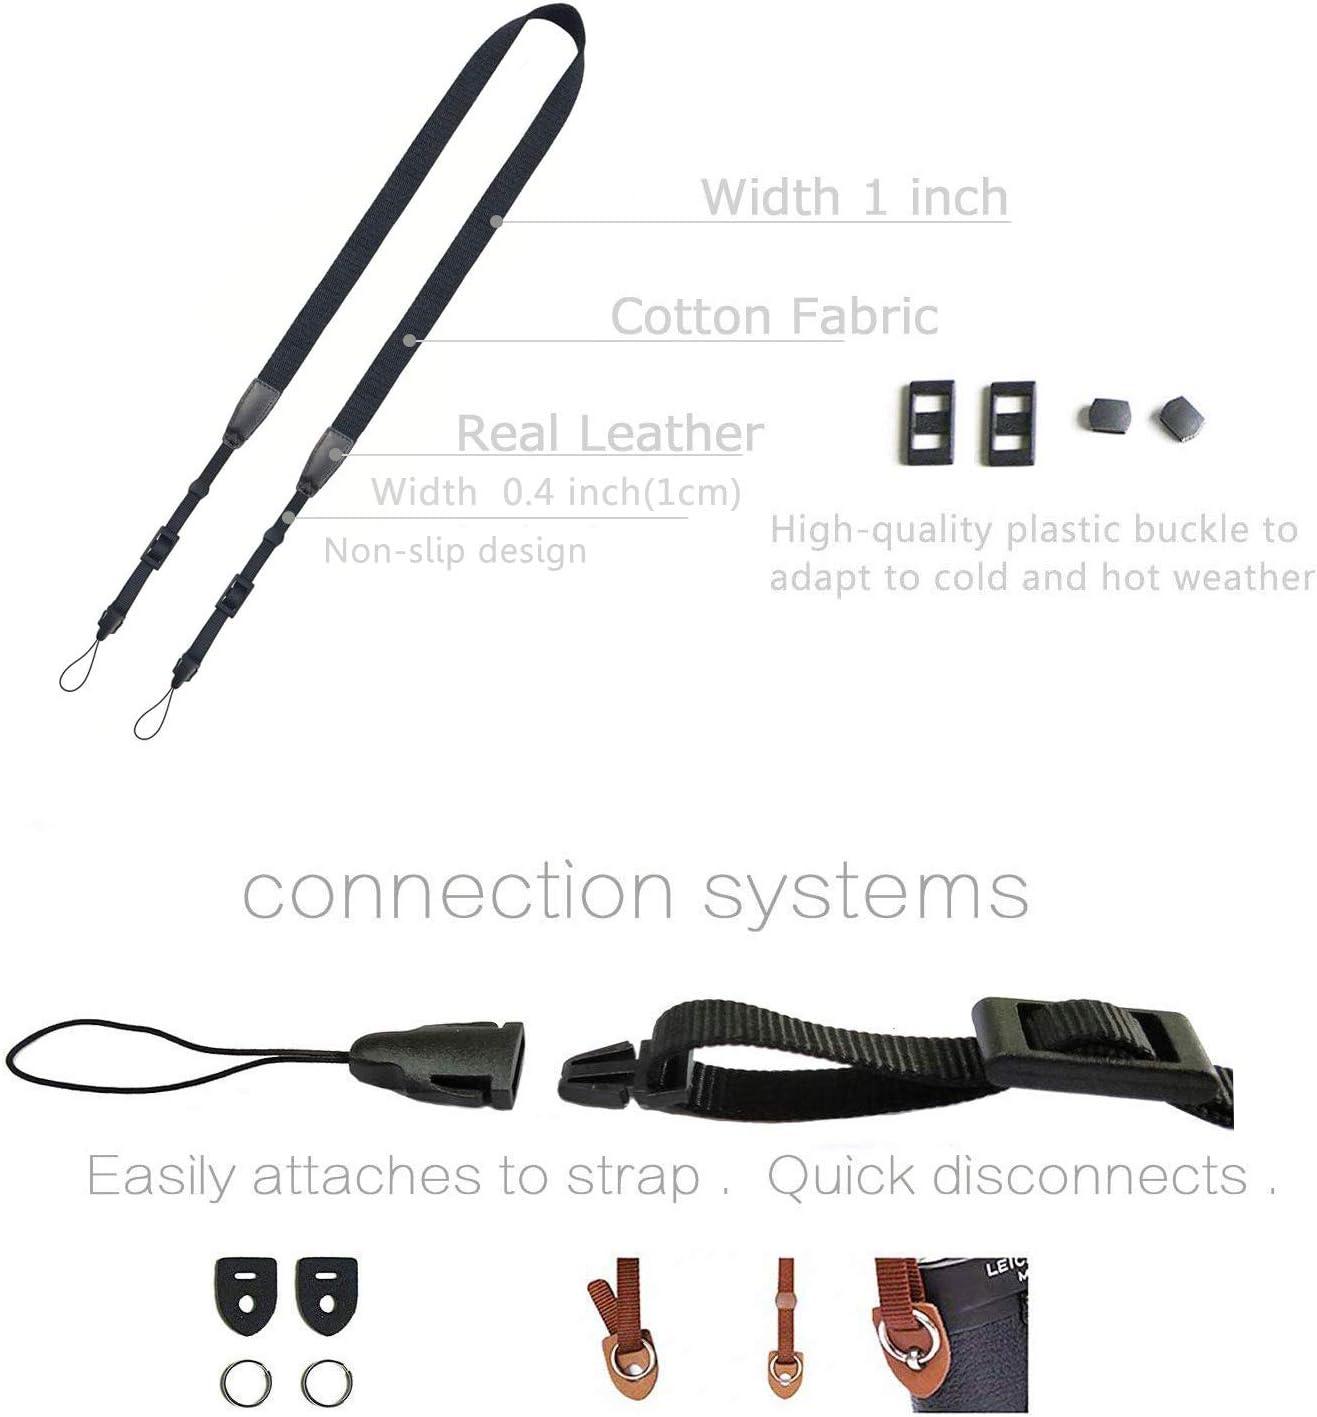 CHMETE Functional Wrist Straps Hand Lanyard for Camera GoPro Phone Flashlight Keychain Flash Drives